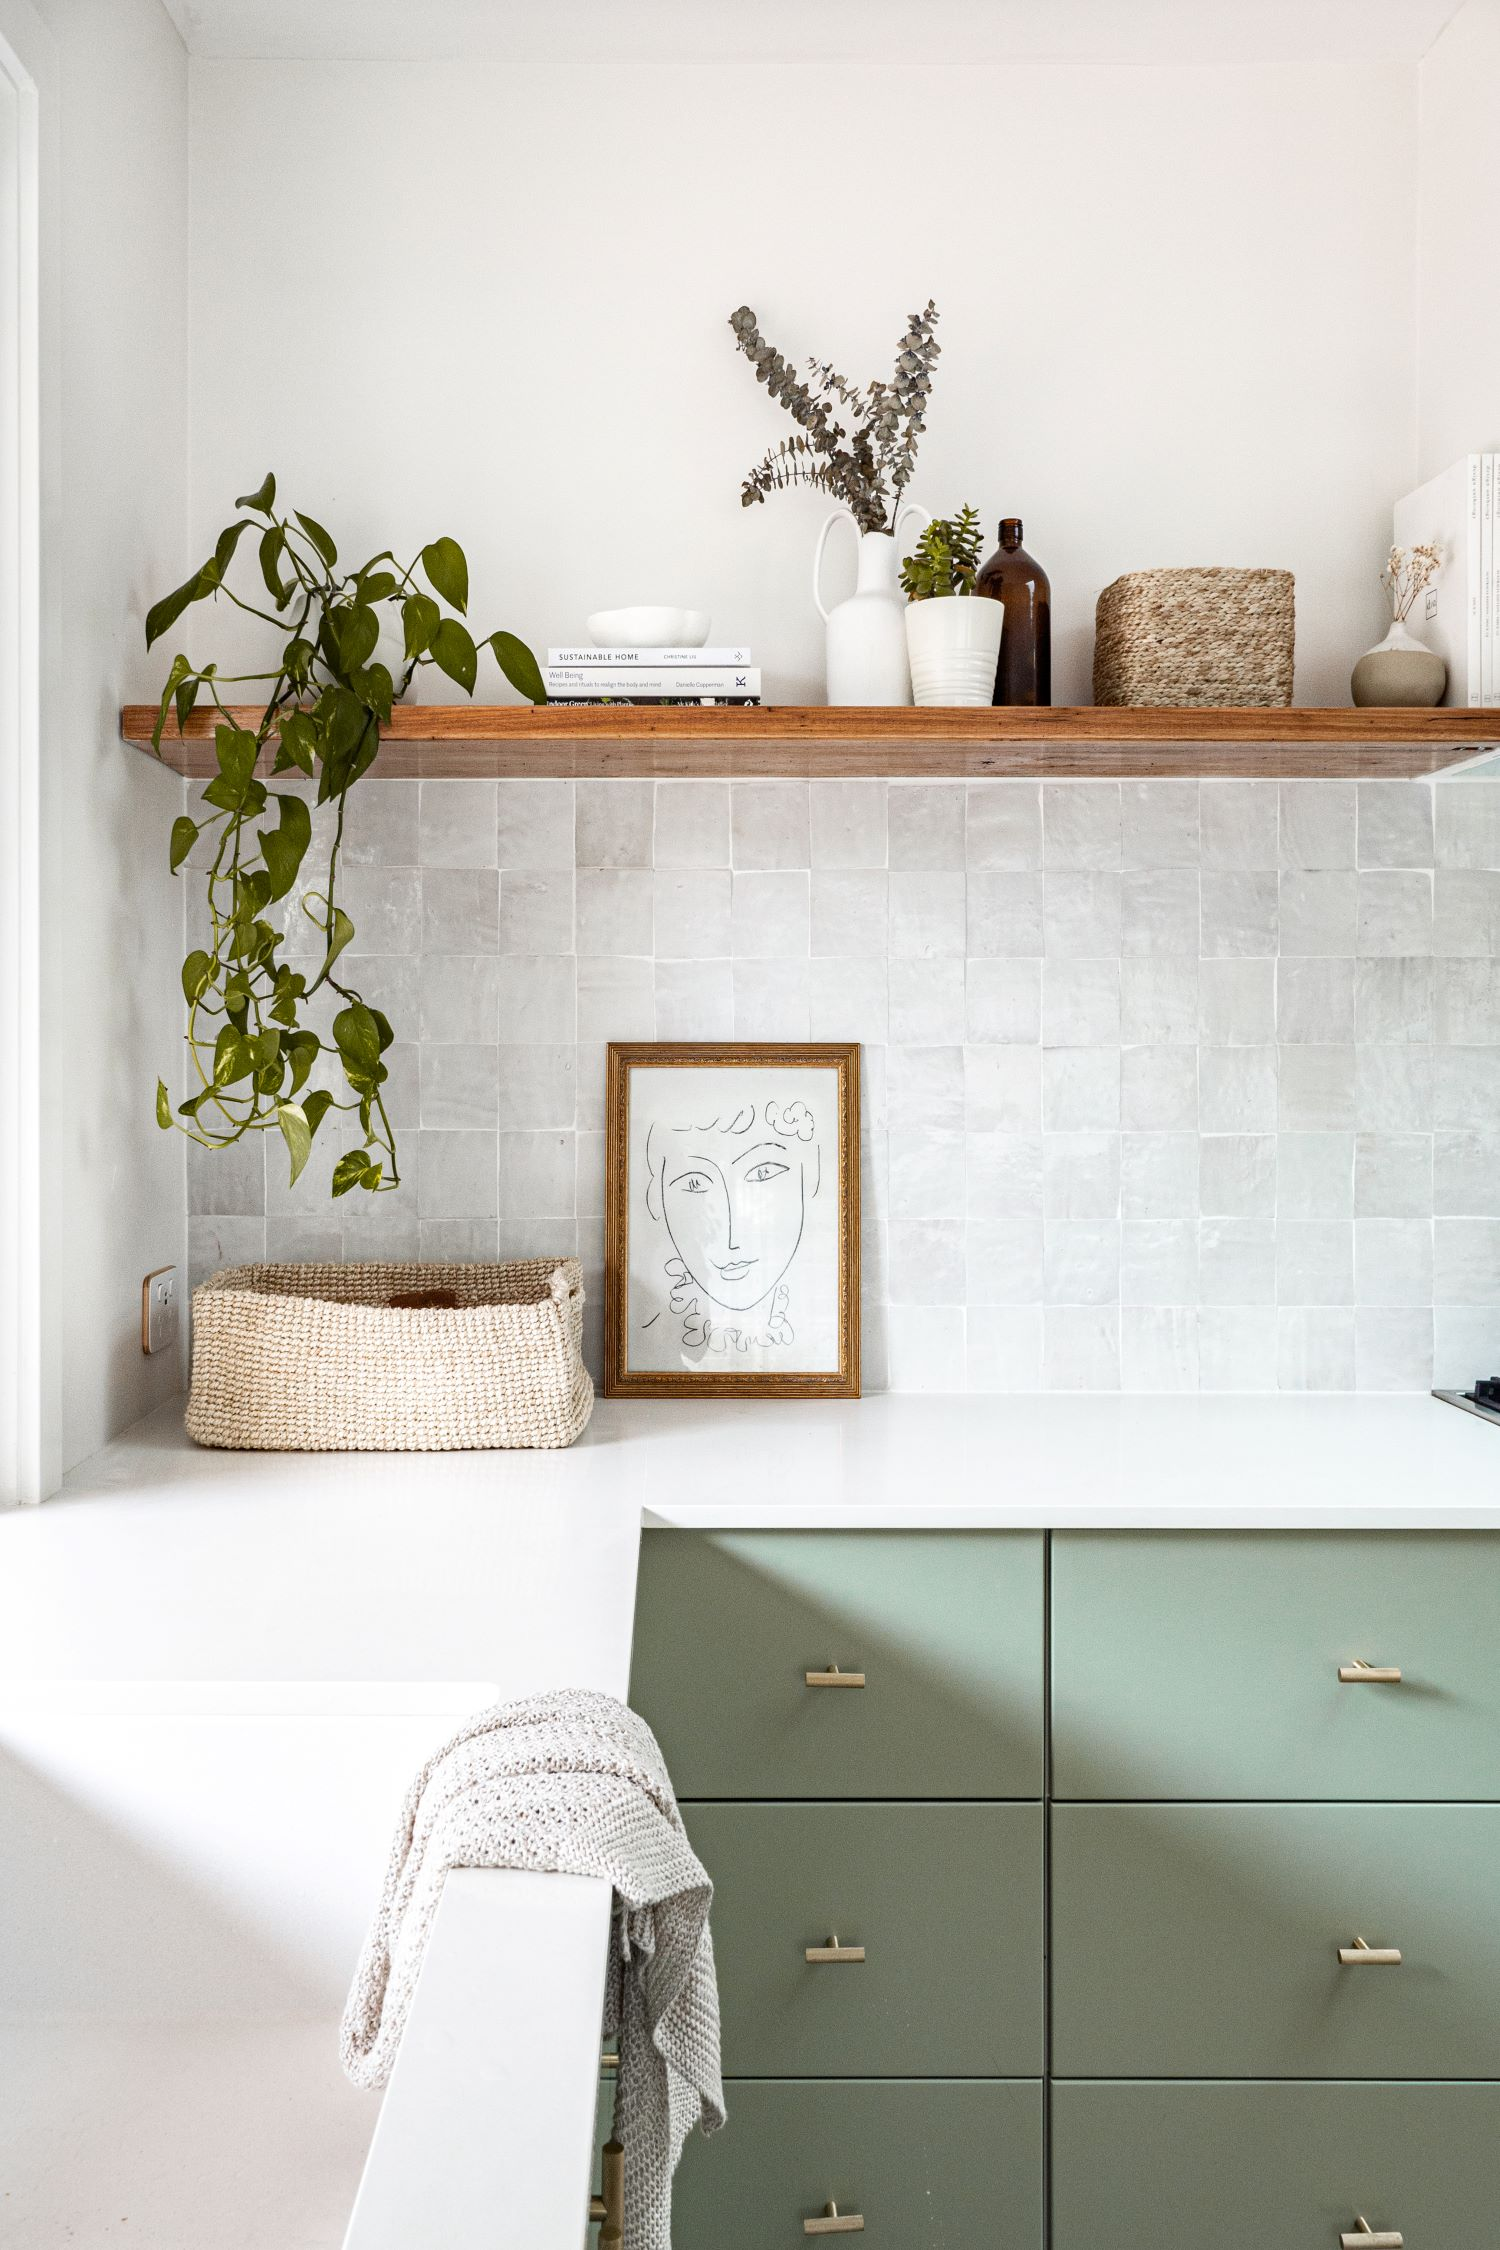 berkeley-vale-cottage-ama-studio-interiors-renovation-kitchen-open-shelves